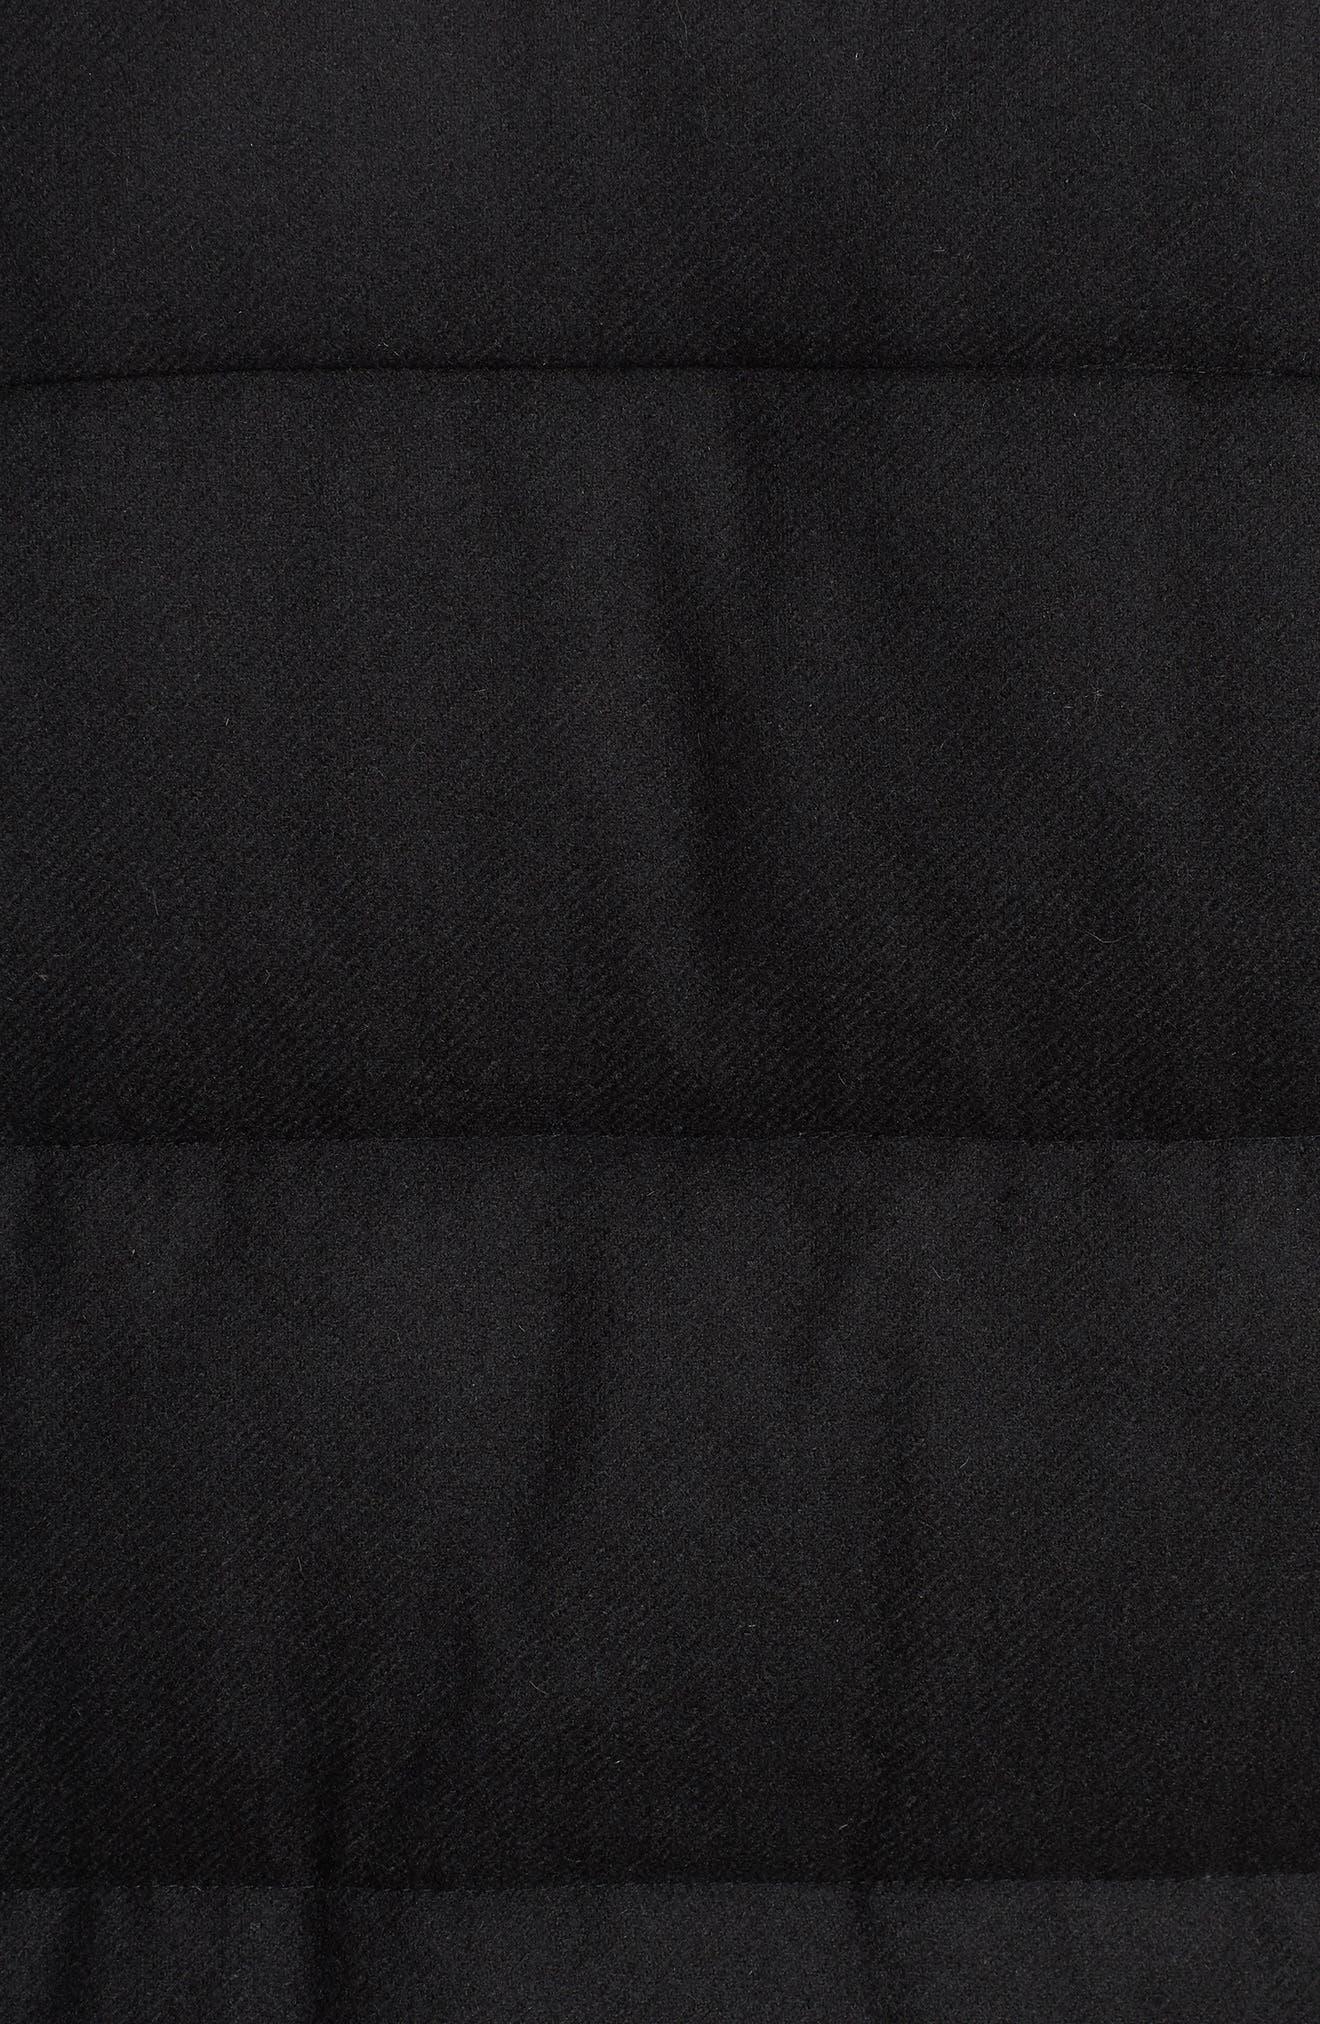 Wool Blend Puffer Jacket,                             Alternate thumbnail 8, color,                             BLACK